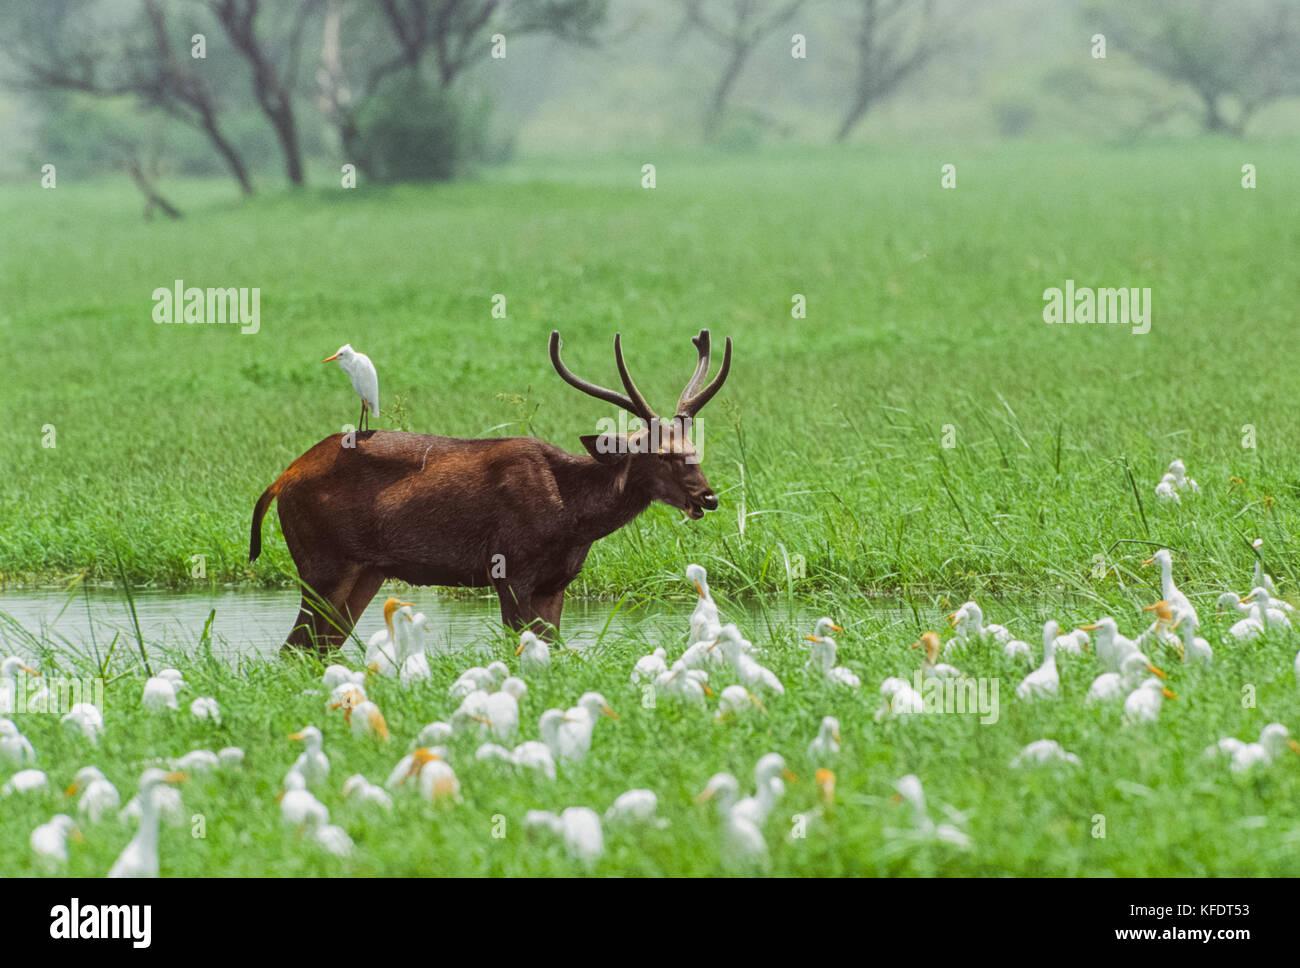 Sambar Deer stag, (Rusa unicolor), Keoladeo Ghana National Park, Bharatpur, Rajasthan, India - Stock Image